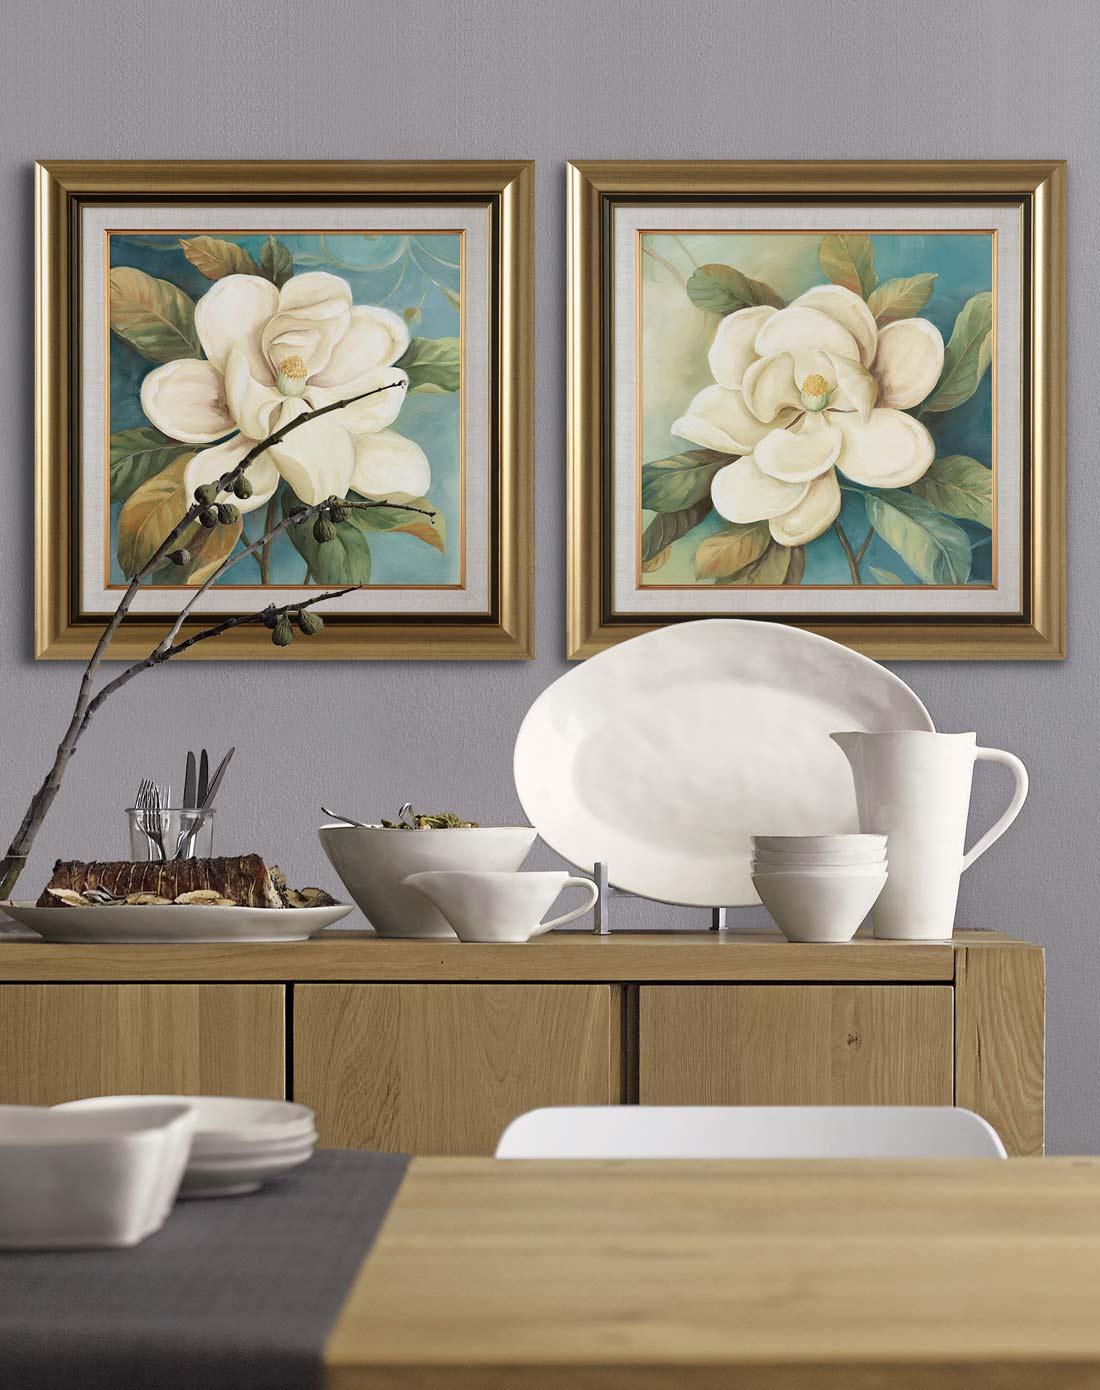 70*70cm玉兰花欧式客厅卧室装饰画